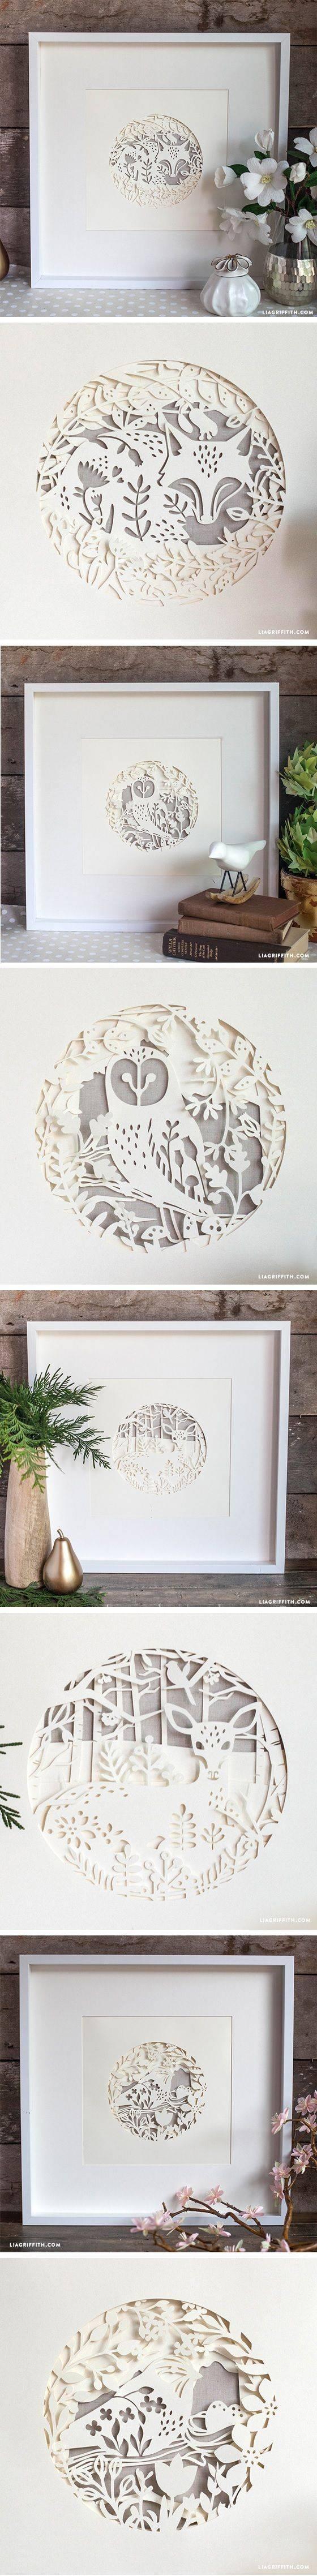 25+ Unique 3D Wall Art Ideas On Pinterest | Butterfly Wall, Diy Regarding Best And Newest Animals 3D Wall Art (View 2 of 20)